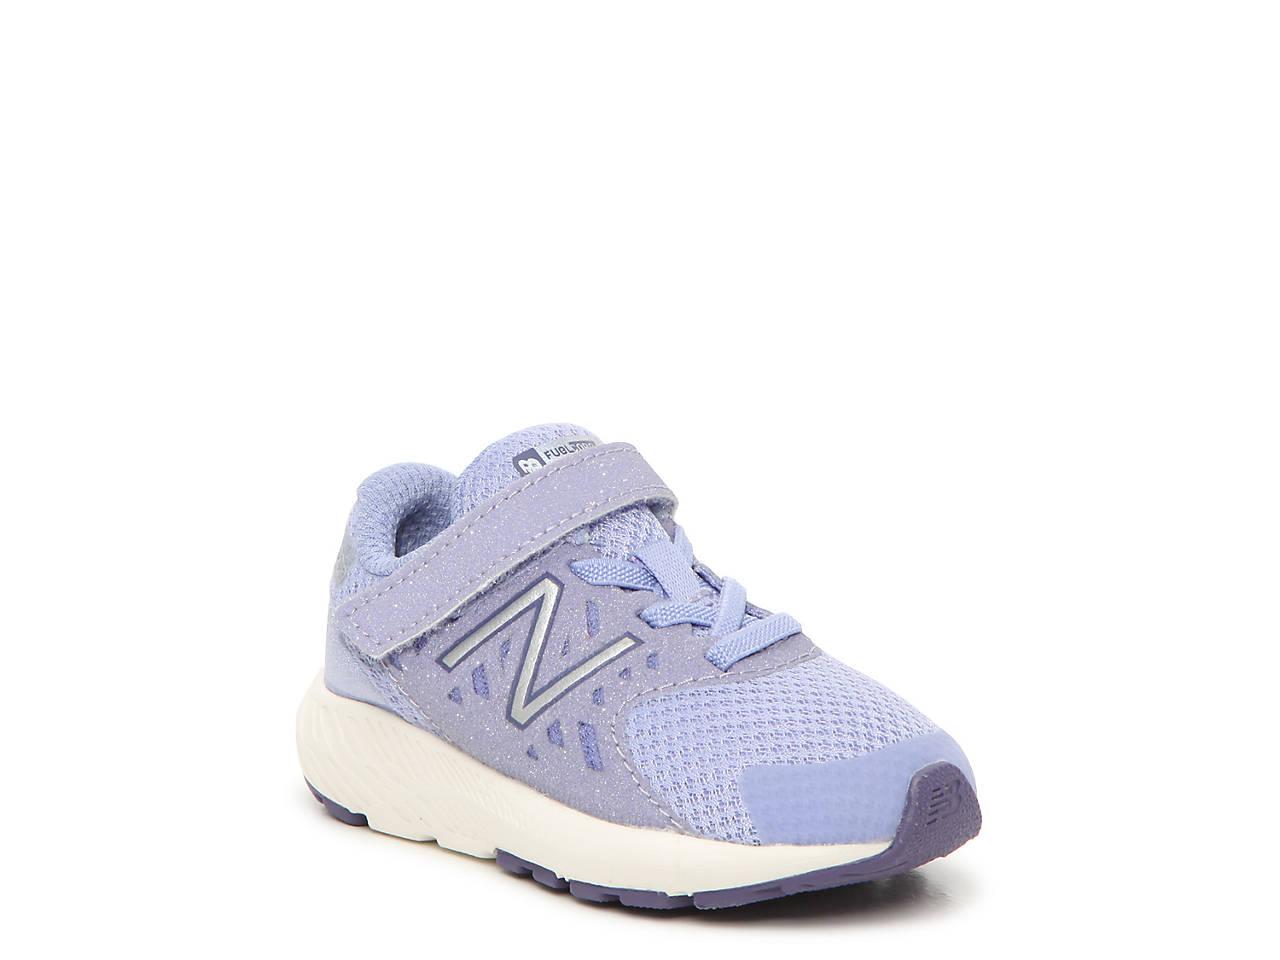 e0d0d647f7a26 New Balance FuelCore Urge v2 Sneaker - Kids' Kids Shoes   DSW